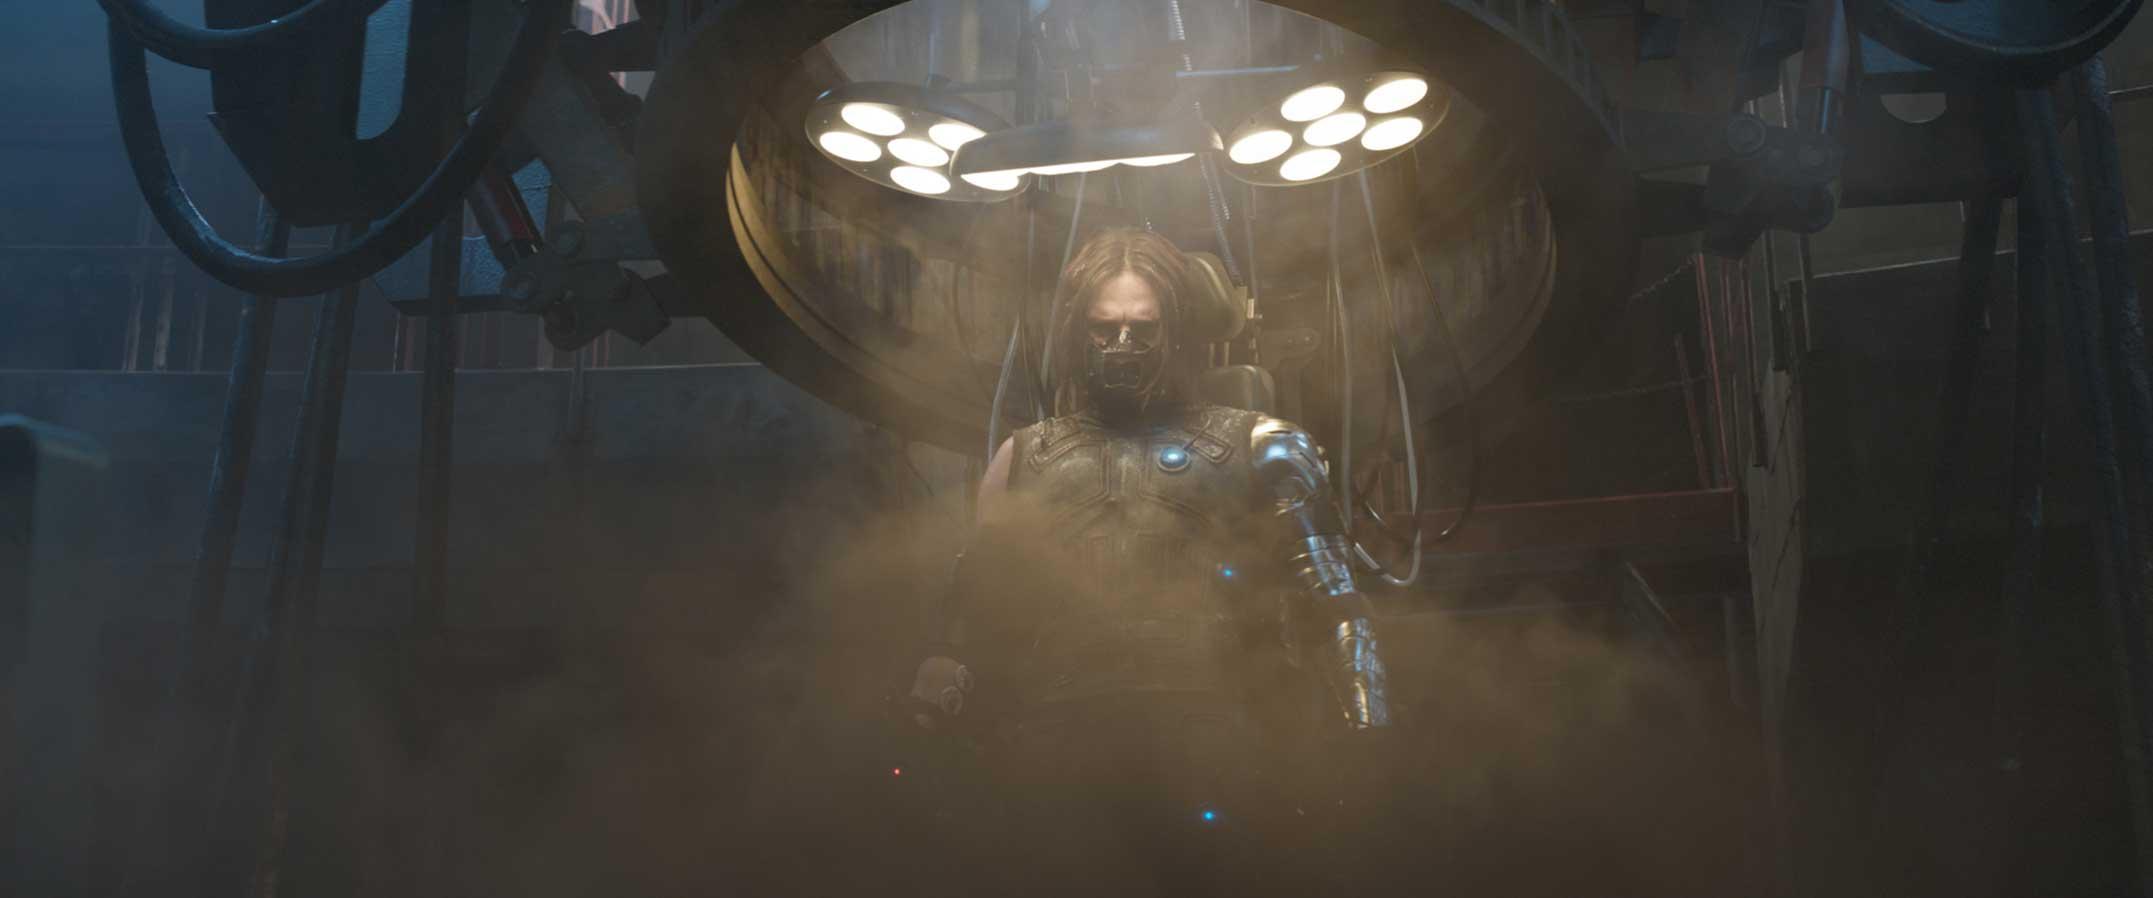 Marvel's Captain America: Civil War Winter Soldier/Bucky Barnes (Sebastian Stan) Photo Credit: Film Frame © Marvel 2016